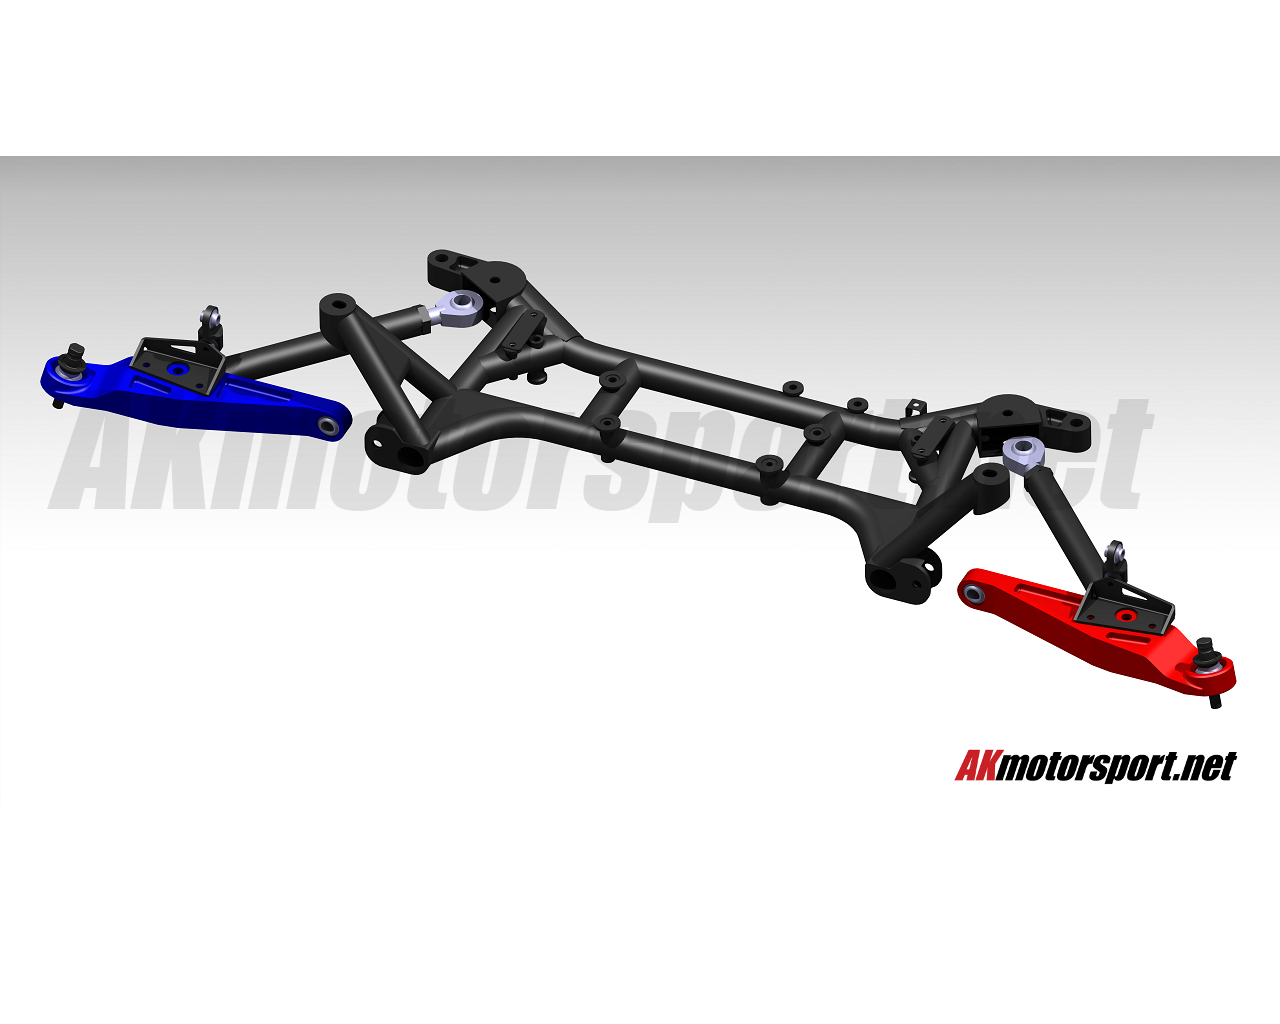 Mitsubishi Lancer Evo X Complete R4 Suspension Kit